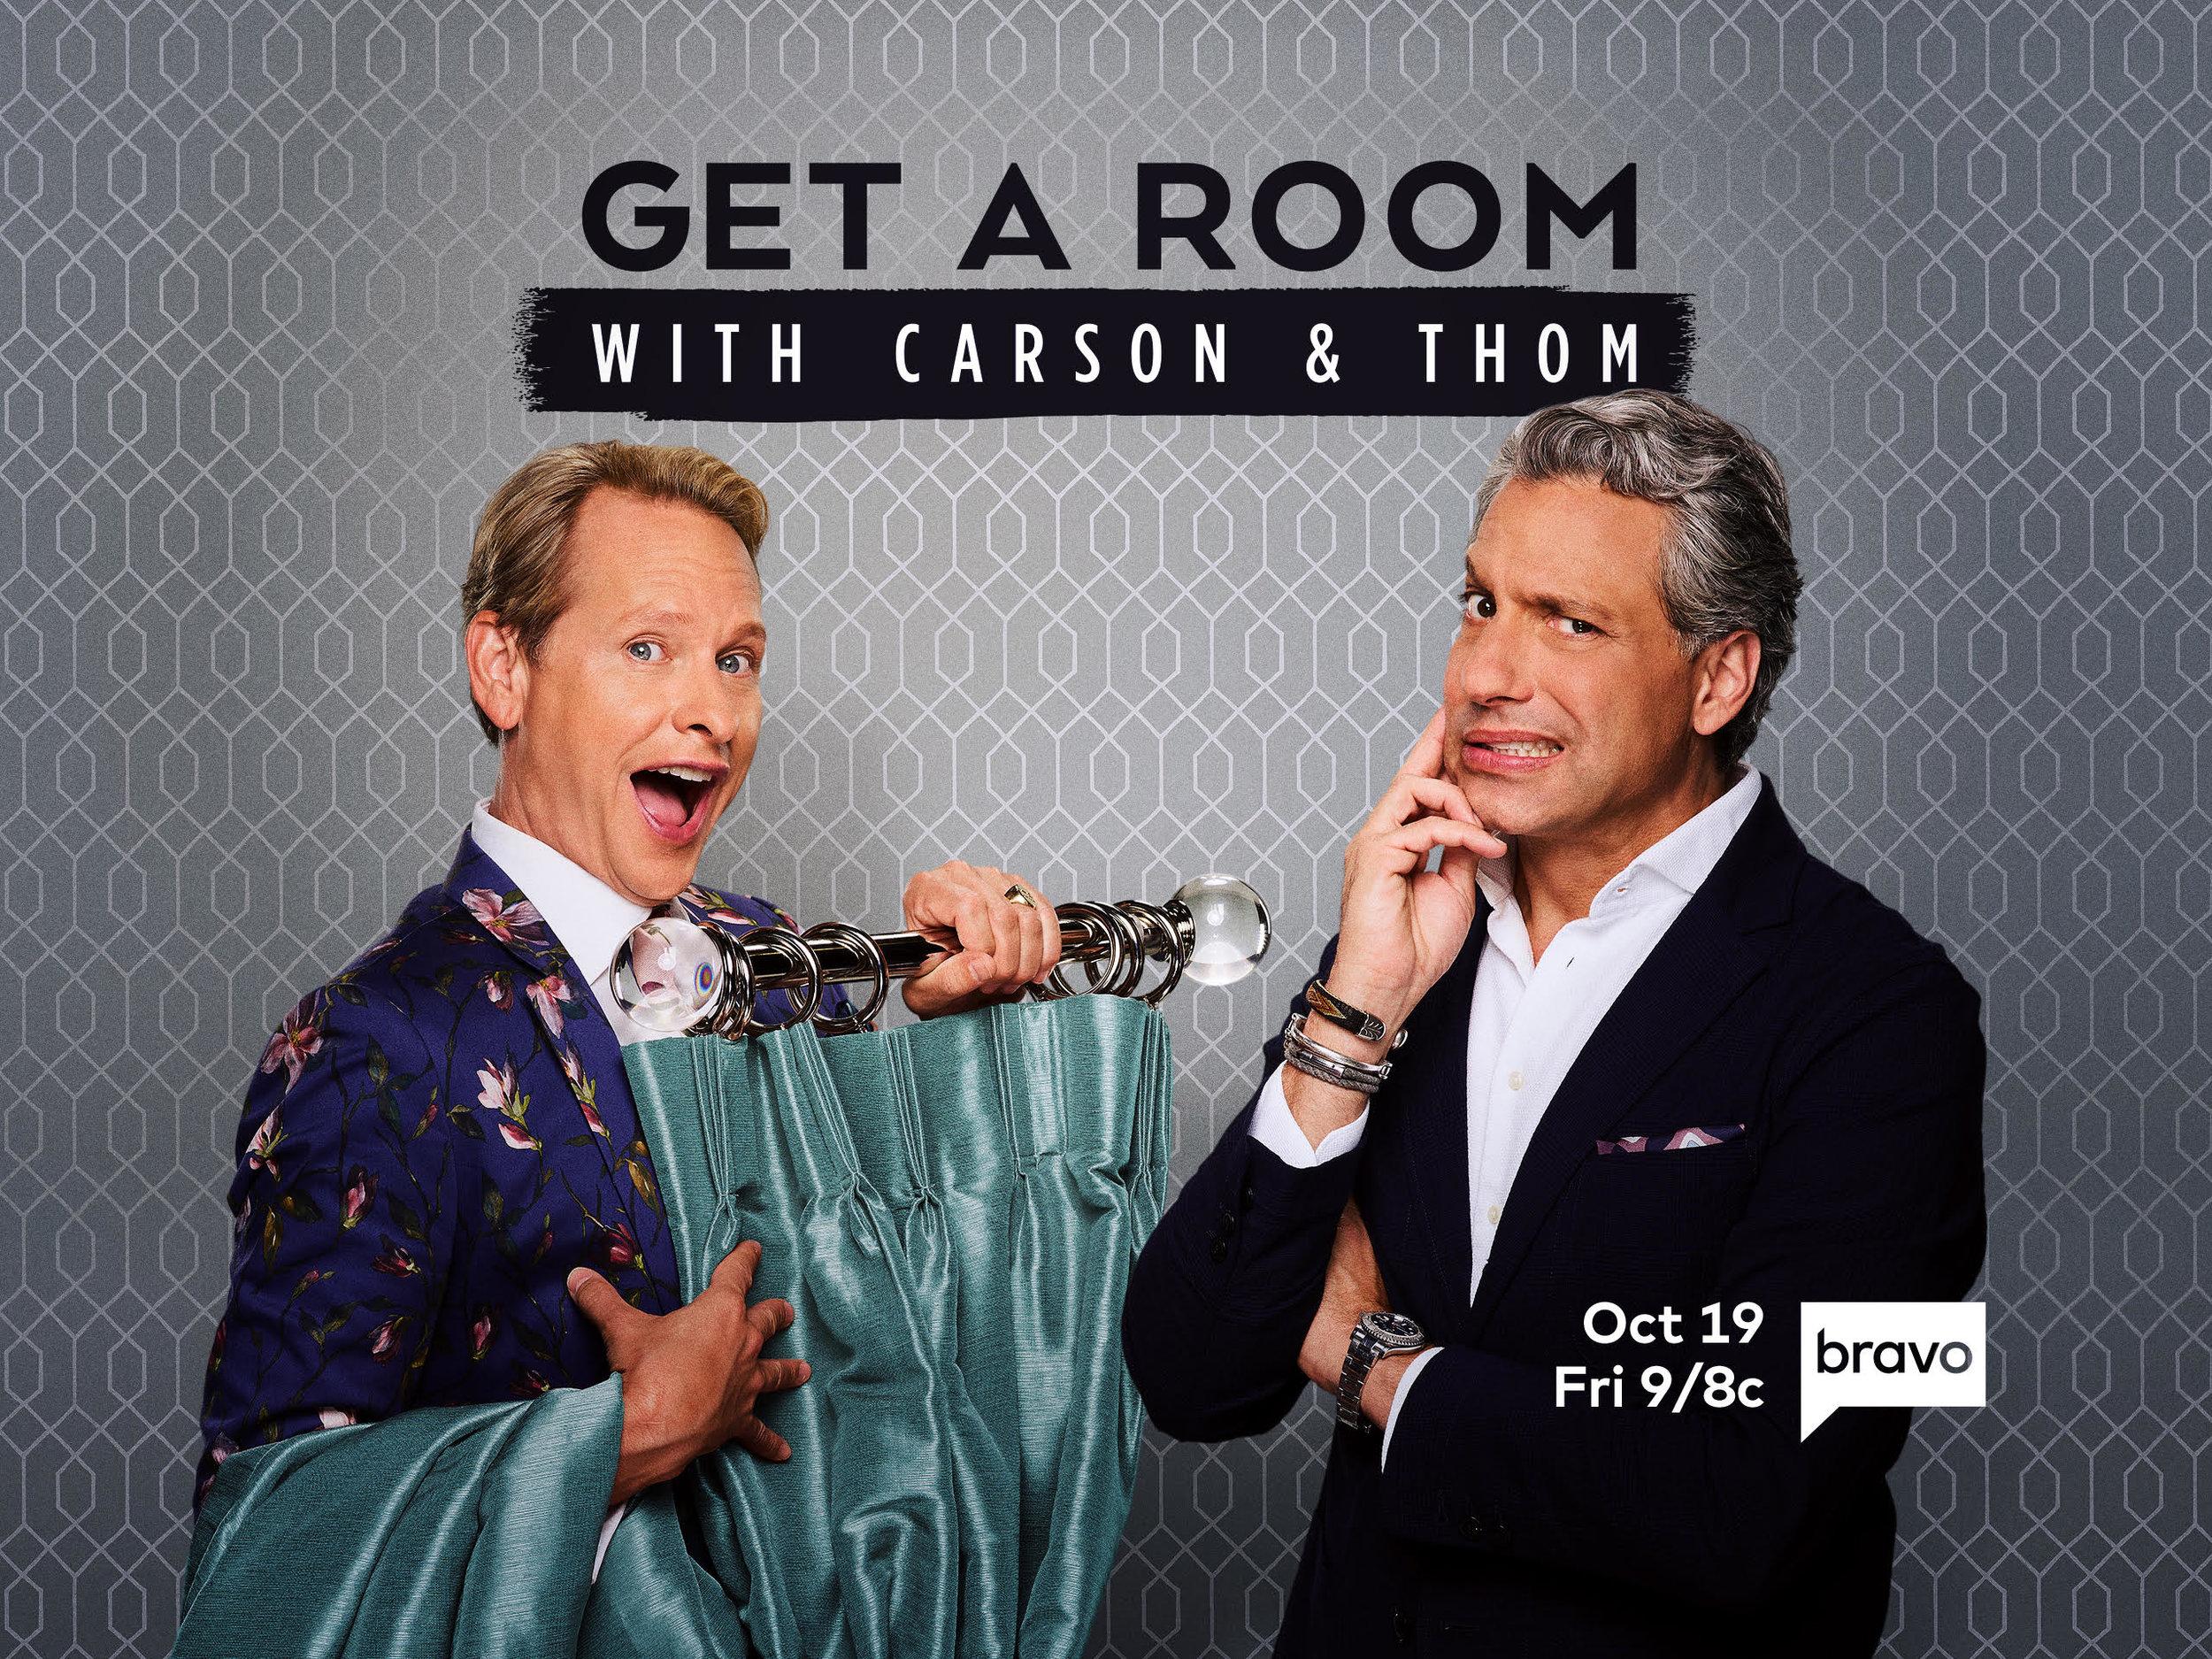 get a room.jpg